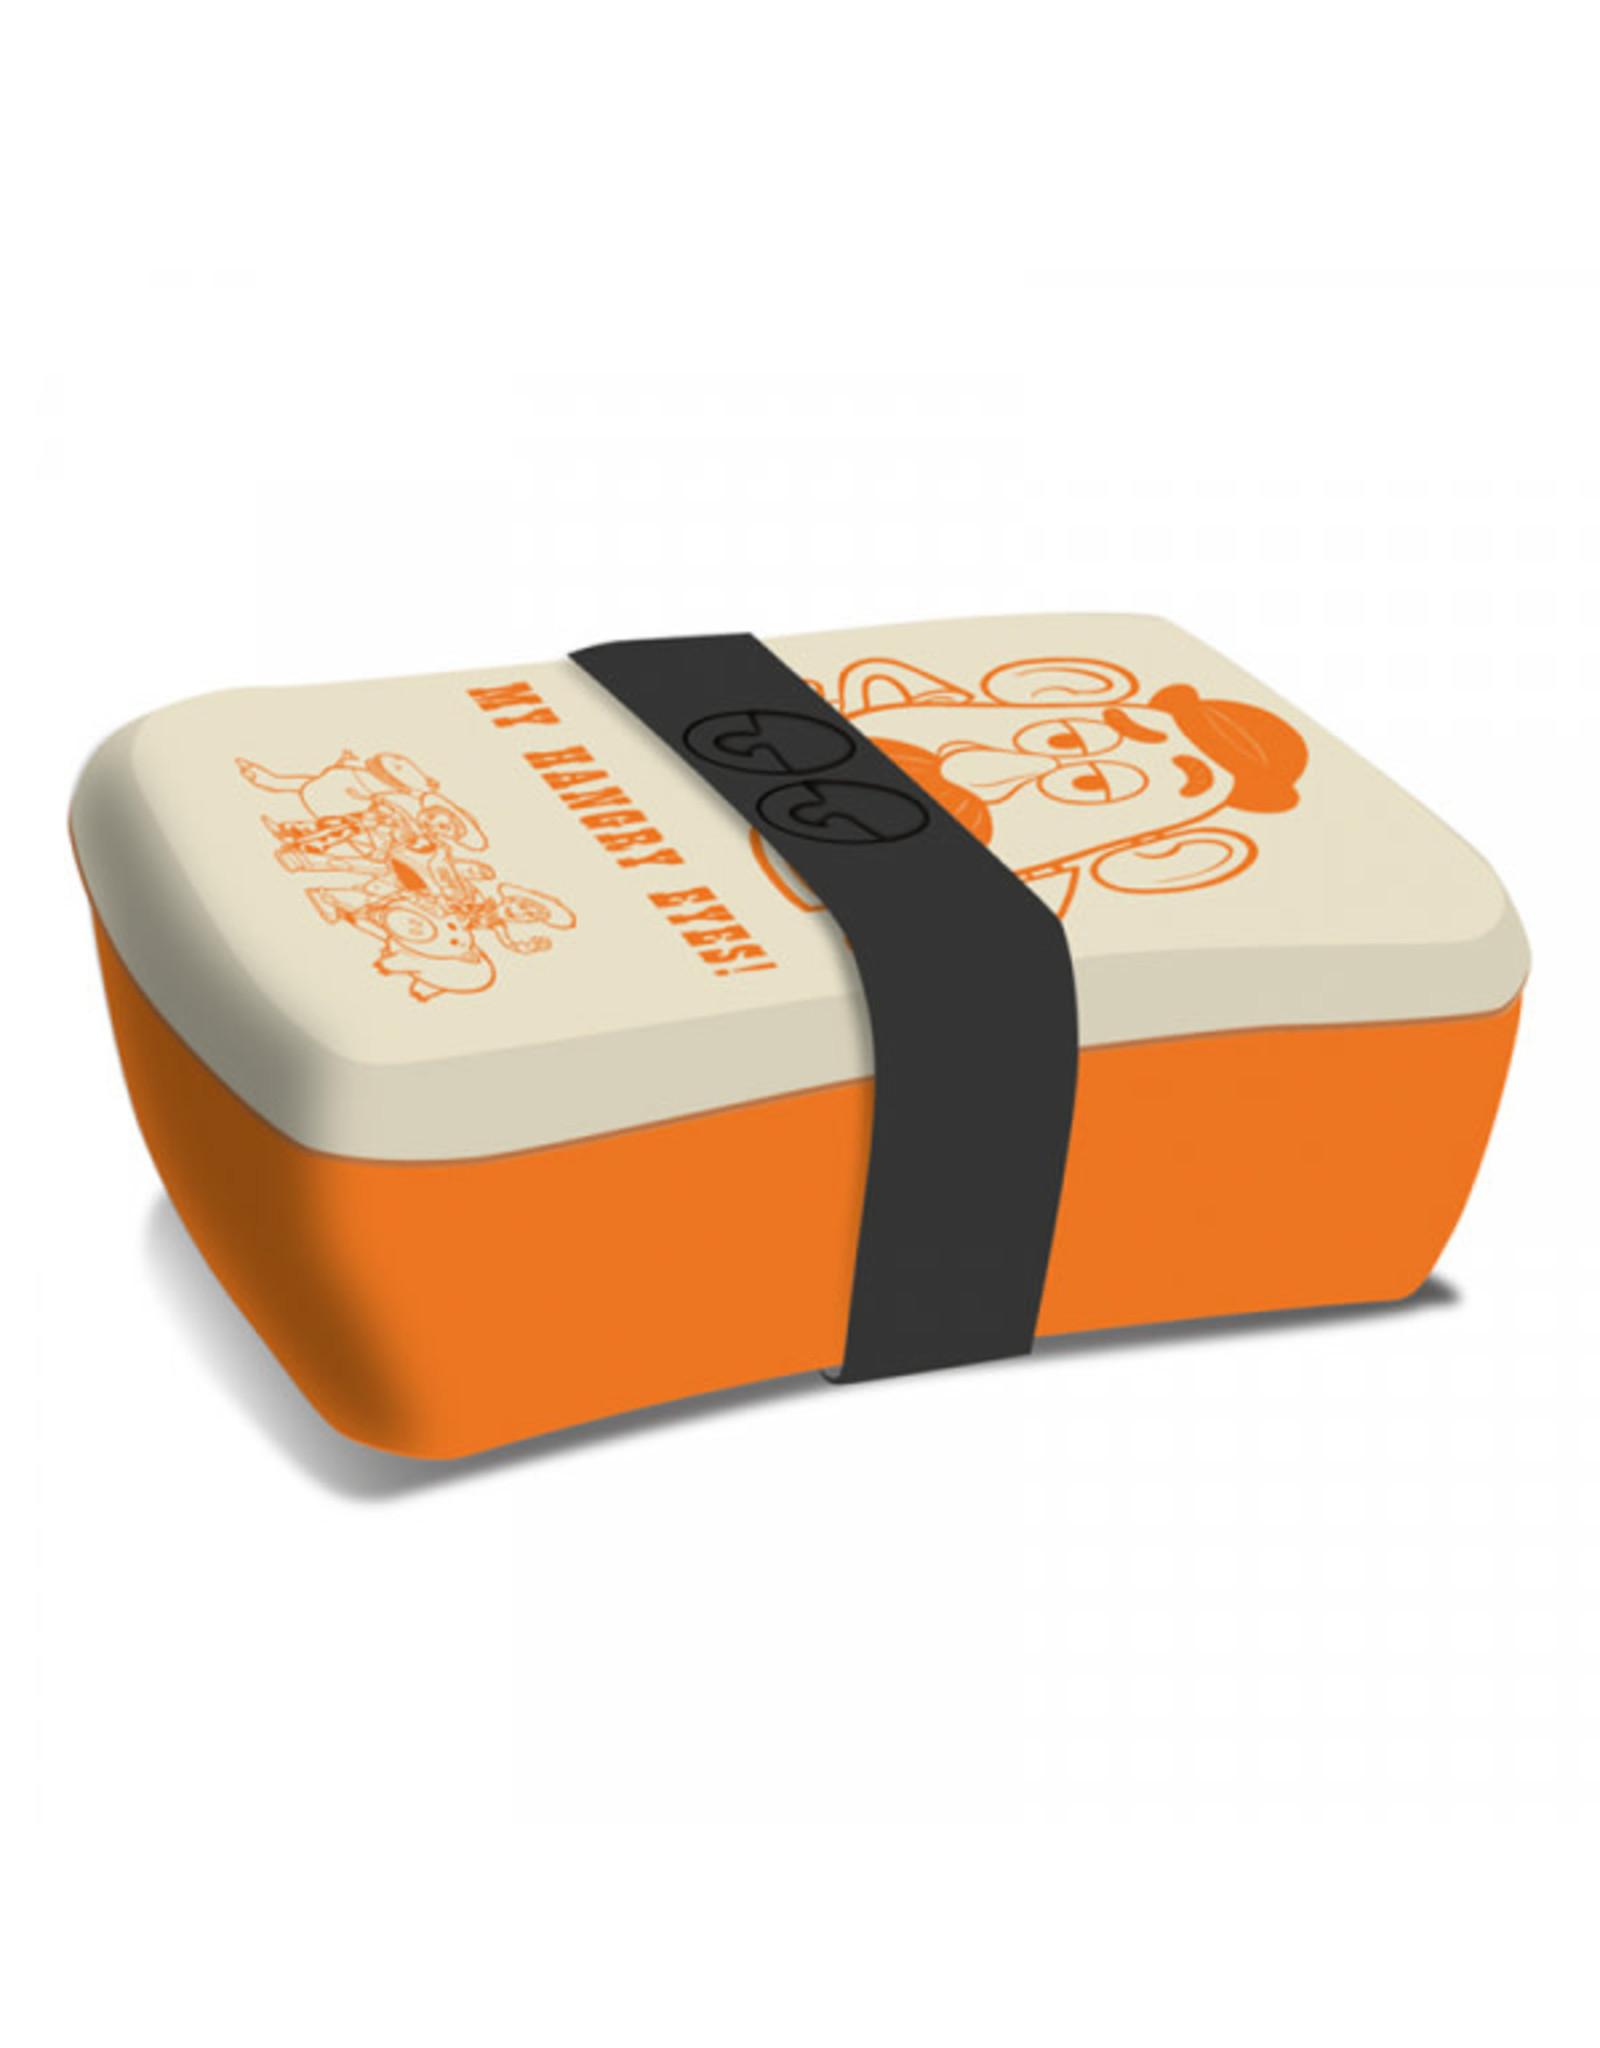 DISNEY - TOY STORY Bamboo Lunch Box - Mr Potato Head